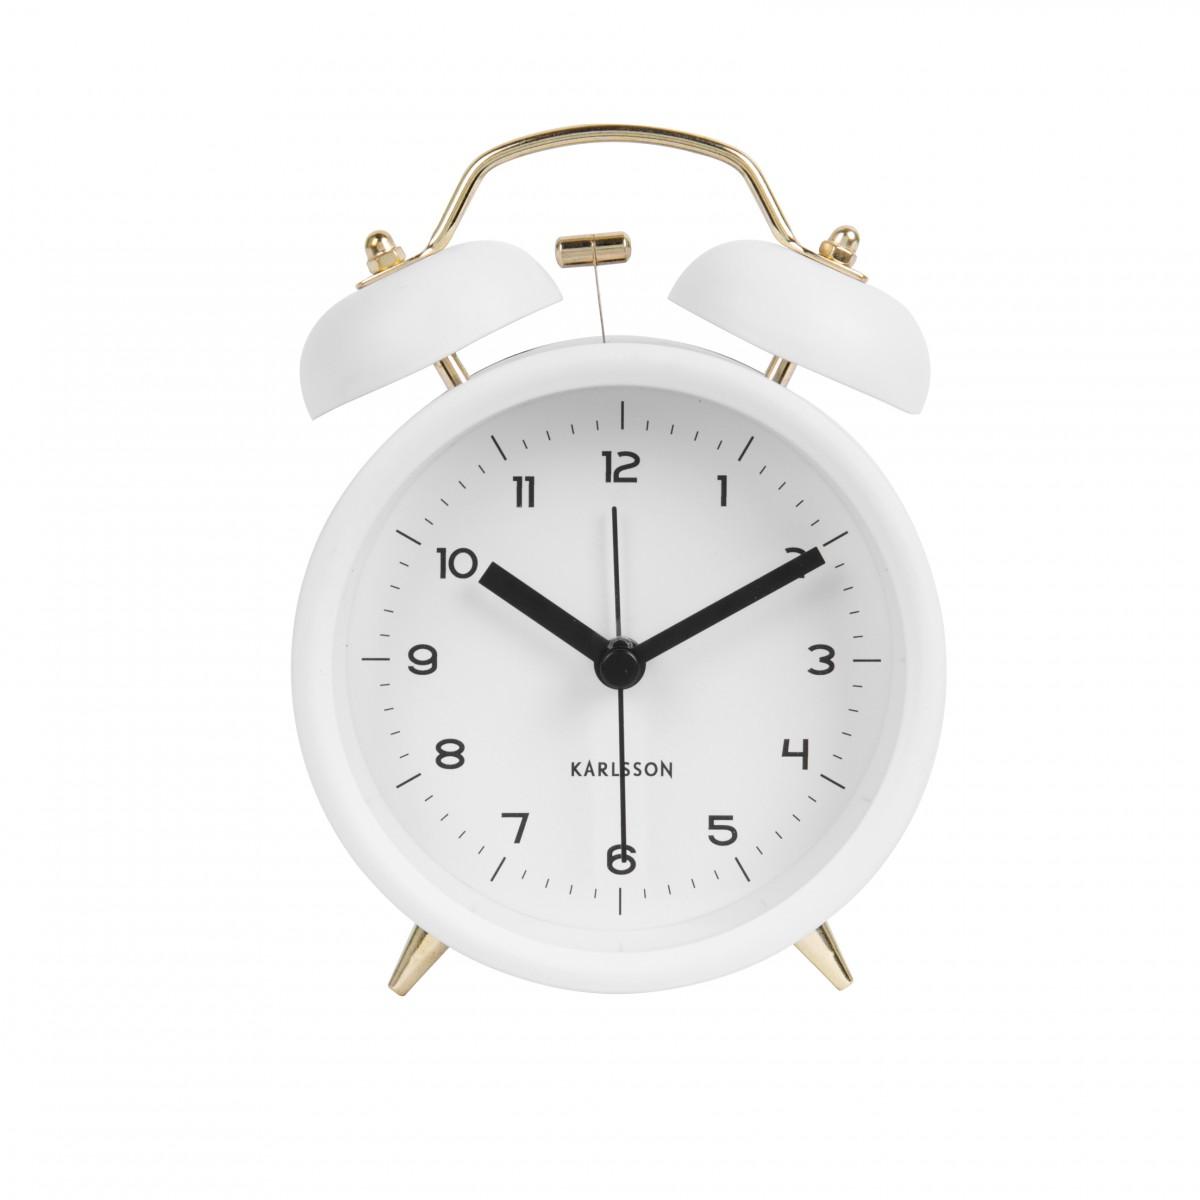 Ceas cu alarmă Classic Bell alb cu auriu, BOX33, Karlsson